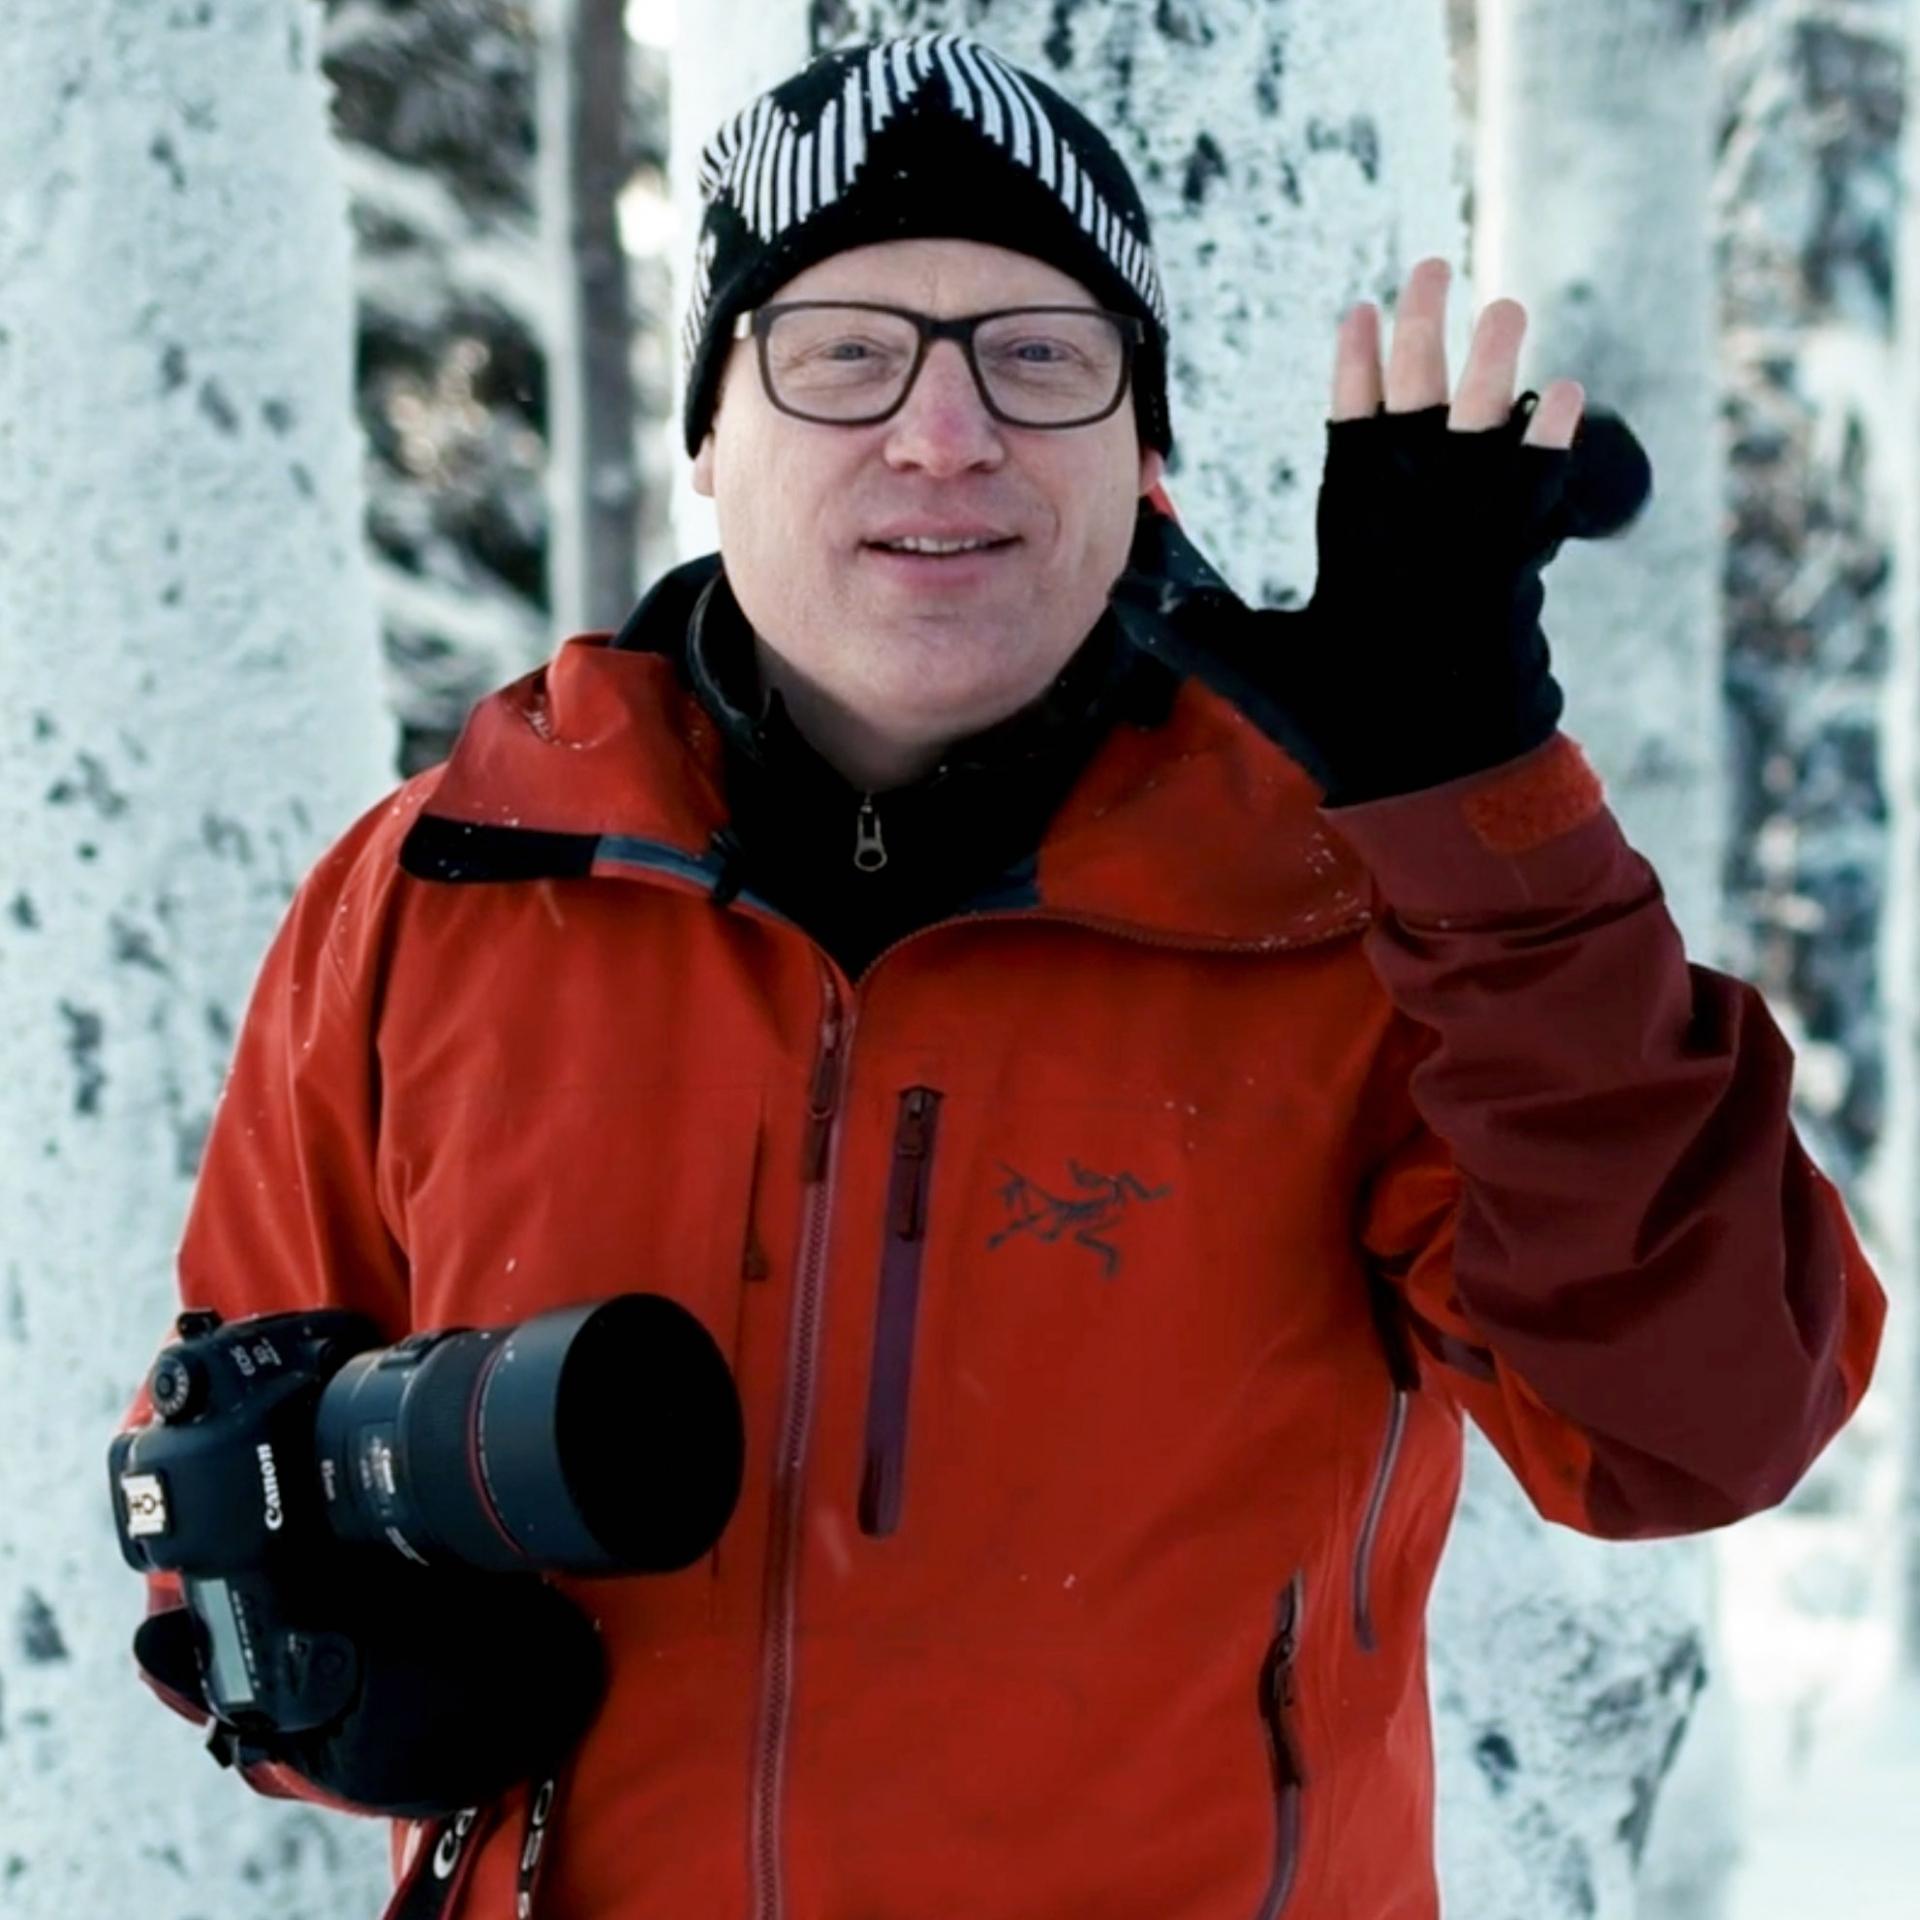 Richard Walch, Handschuhe zum Fotografieren, Fotografieren im Winter